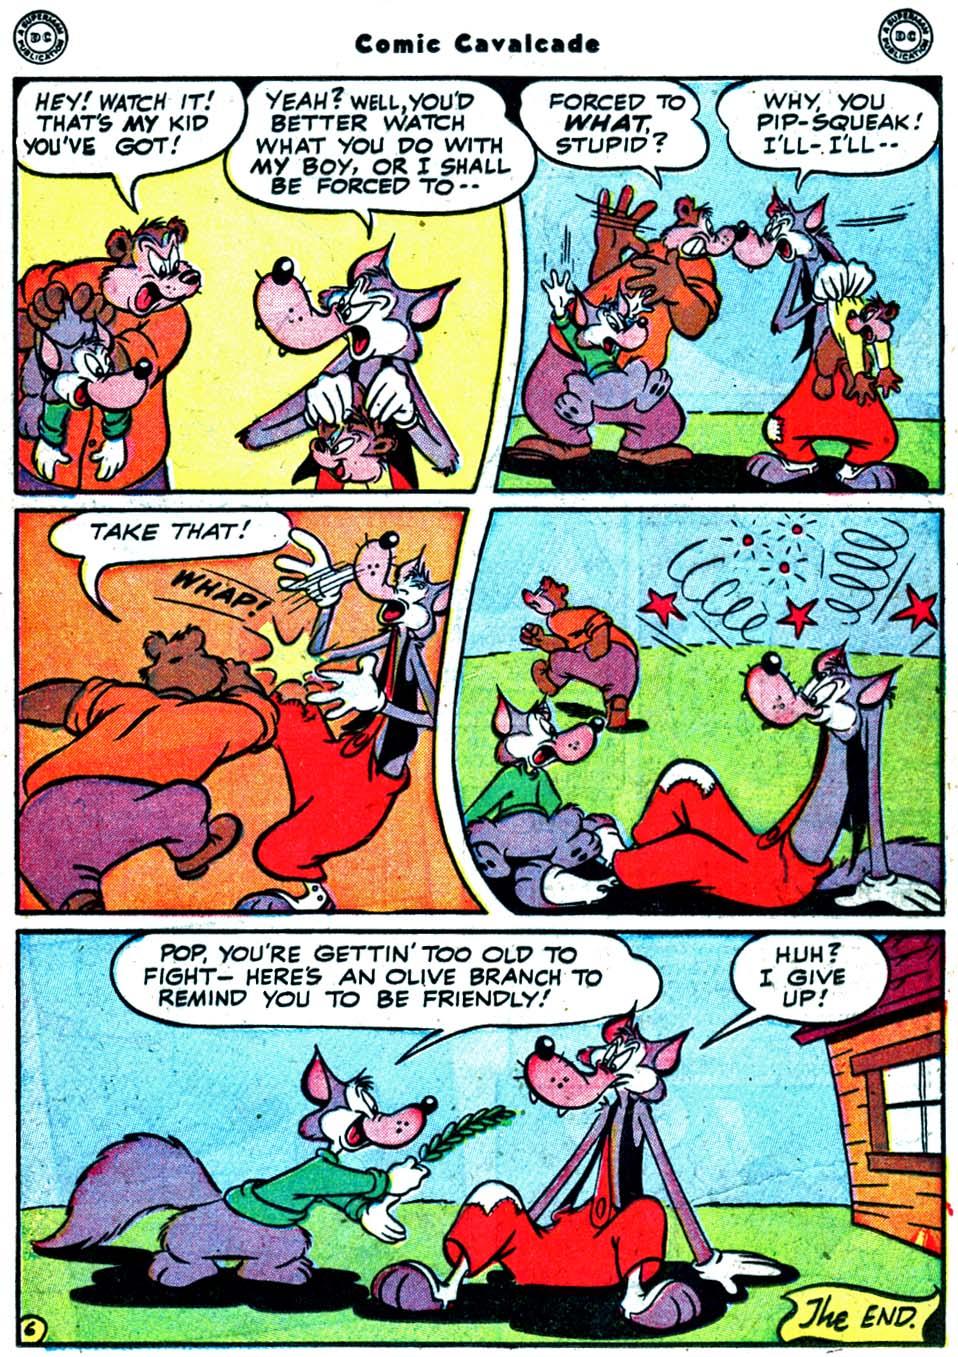 Comic Cavalcade issue 32 - Page 61